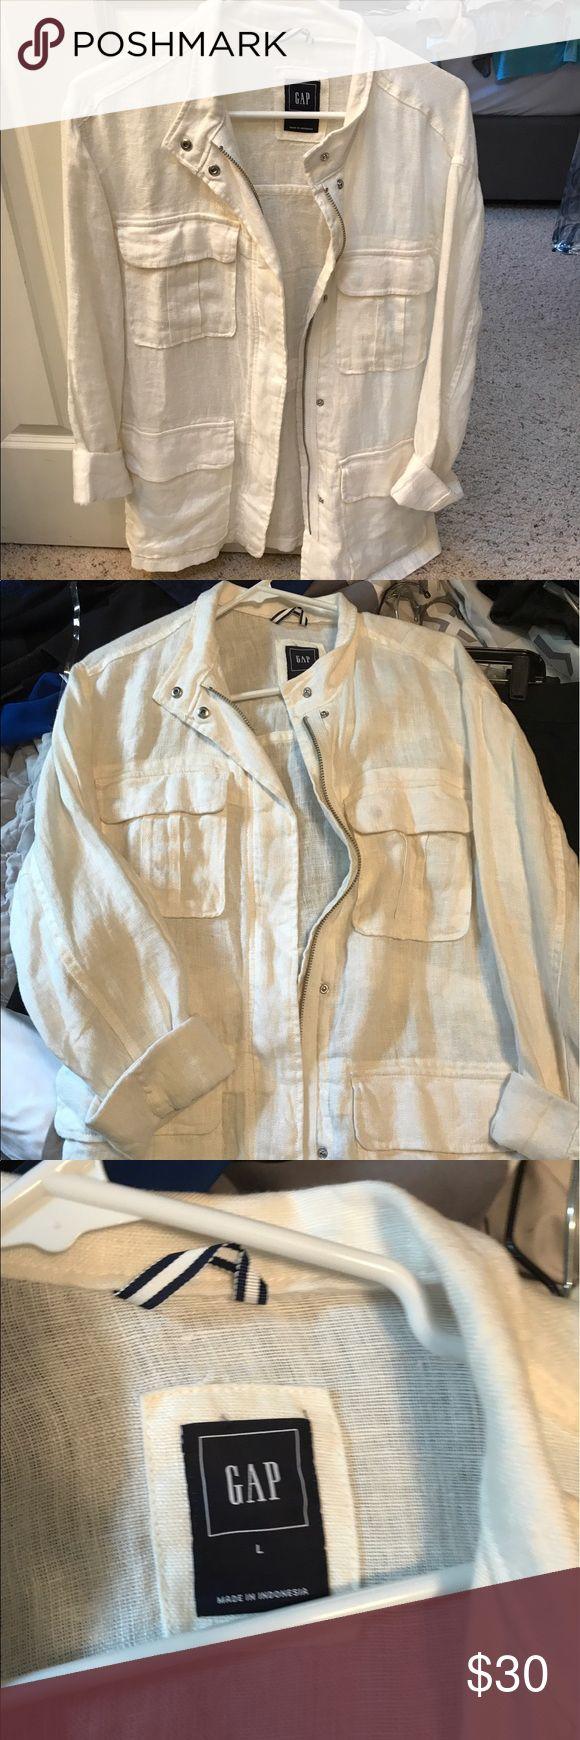 Linen Gap jacket Worn maybe two times. GAP Jackets & Coats Blazers